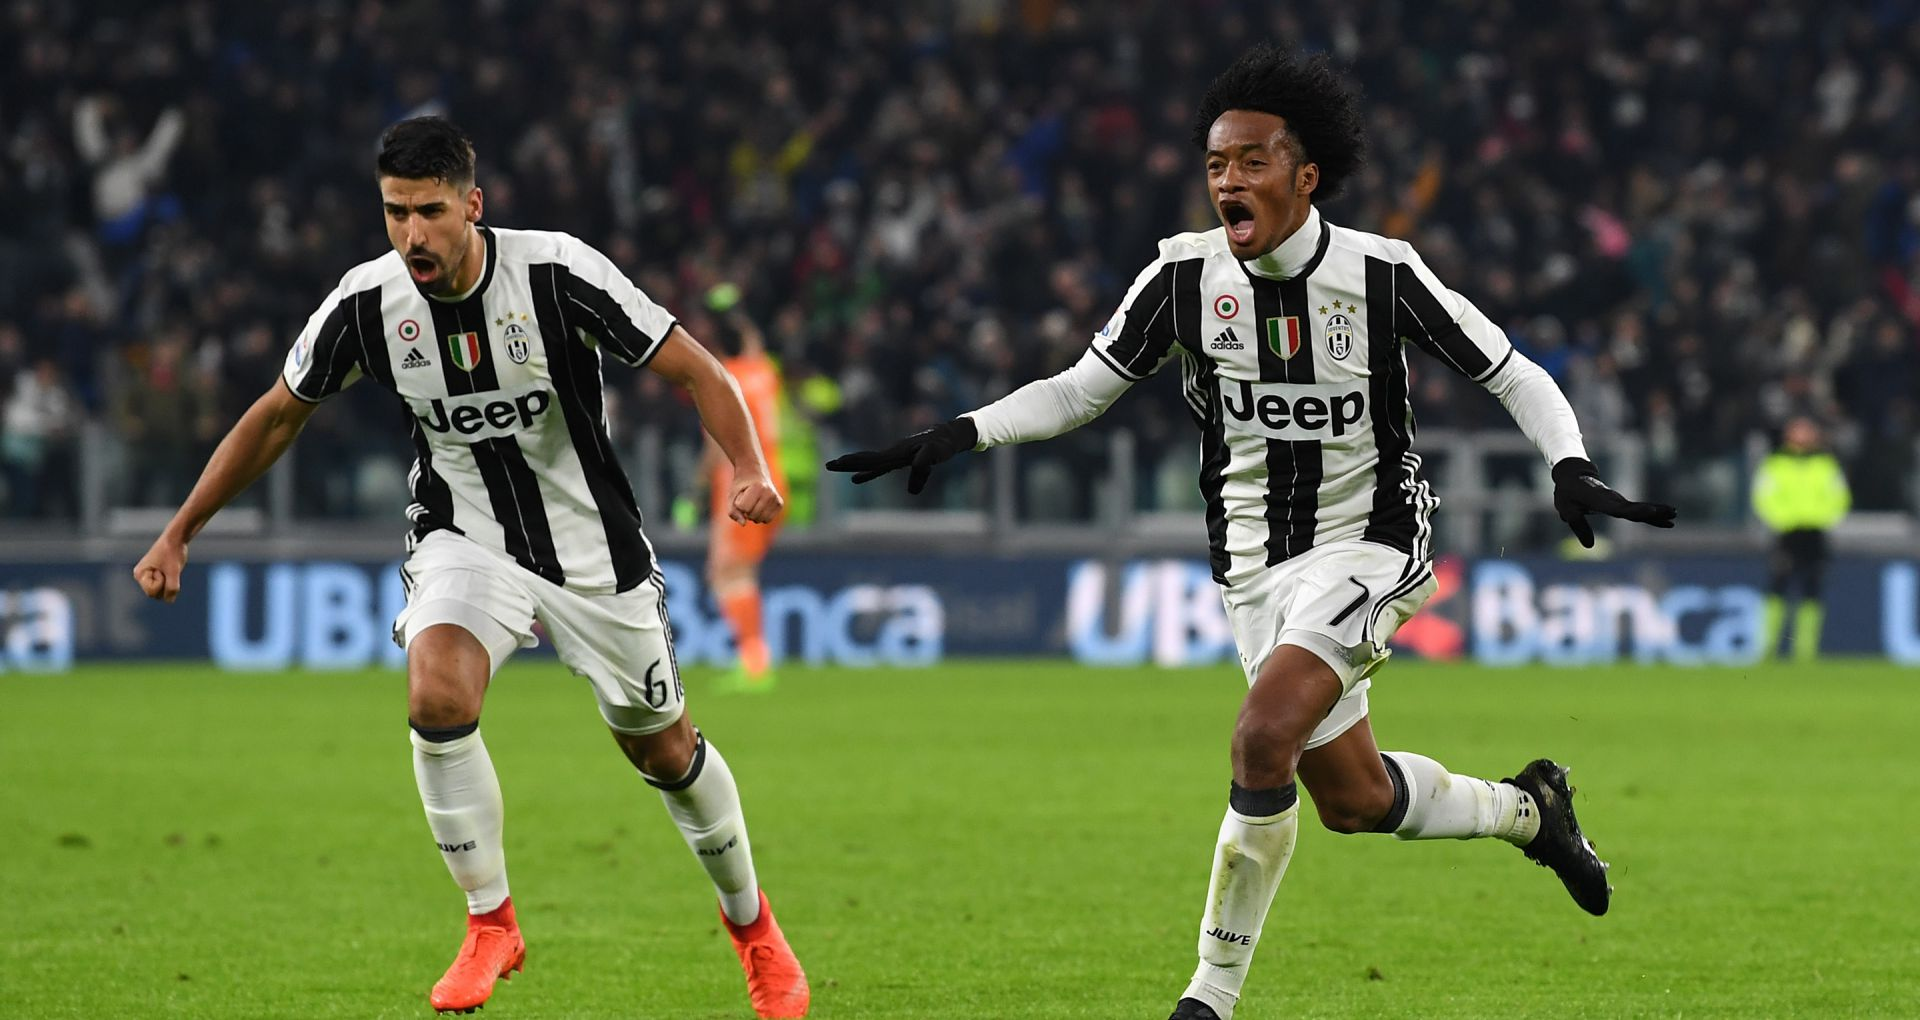 Juan Cuadrado Sami Khedira Juventus Inter Serie A